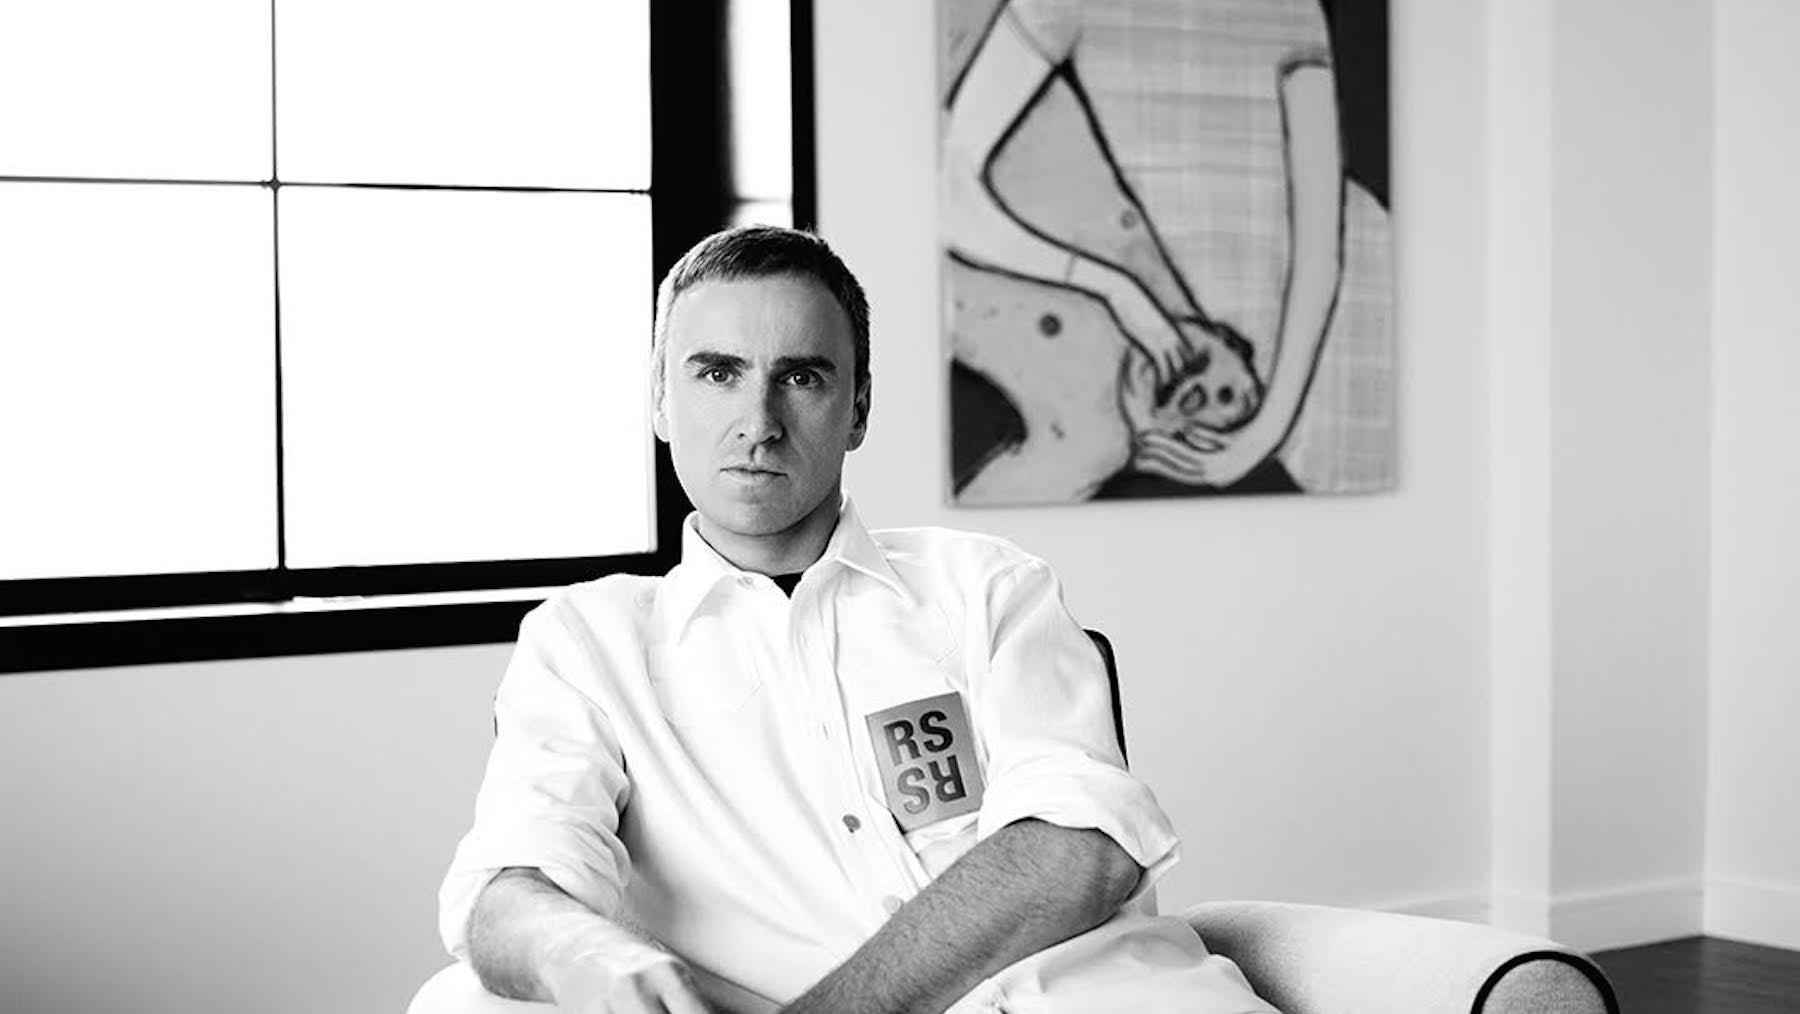 Raf Simons Starts at Calvin Klein, Marking Strategic Shift